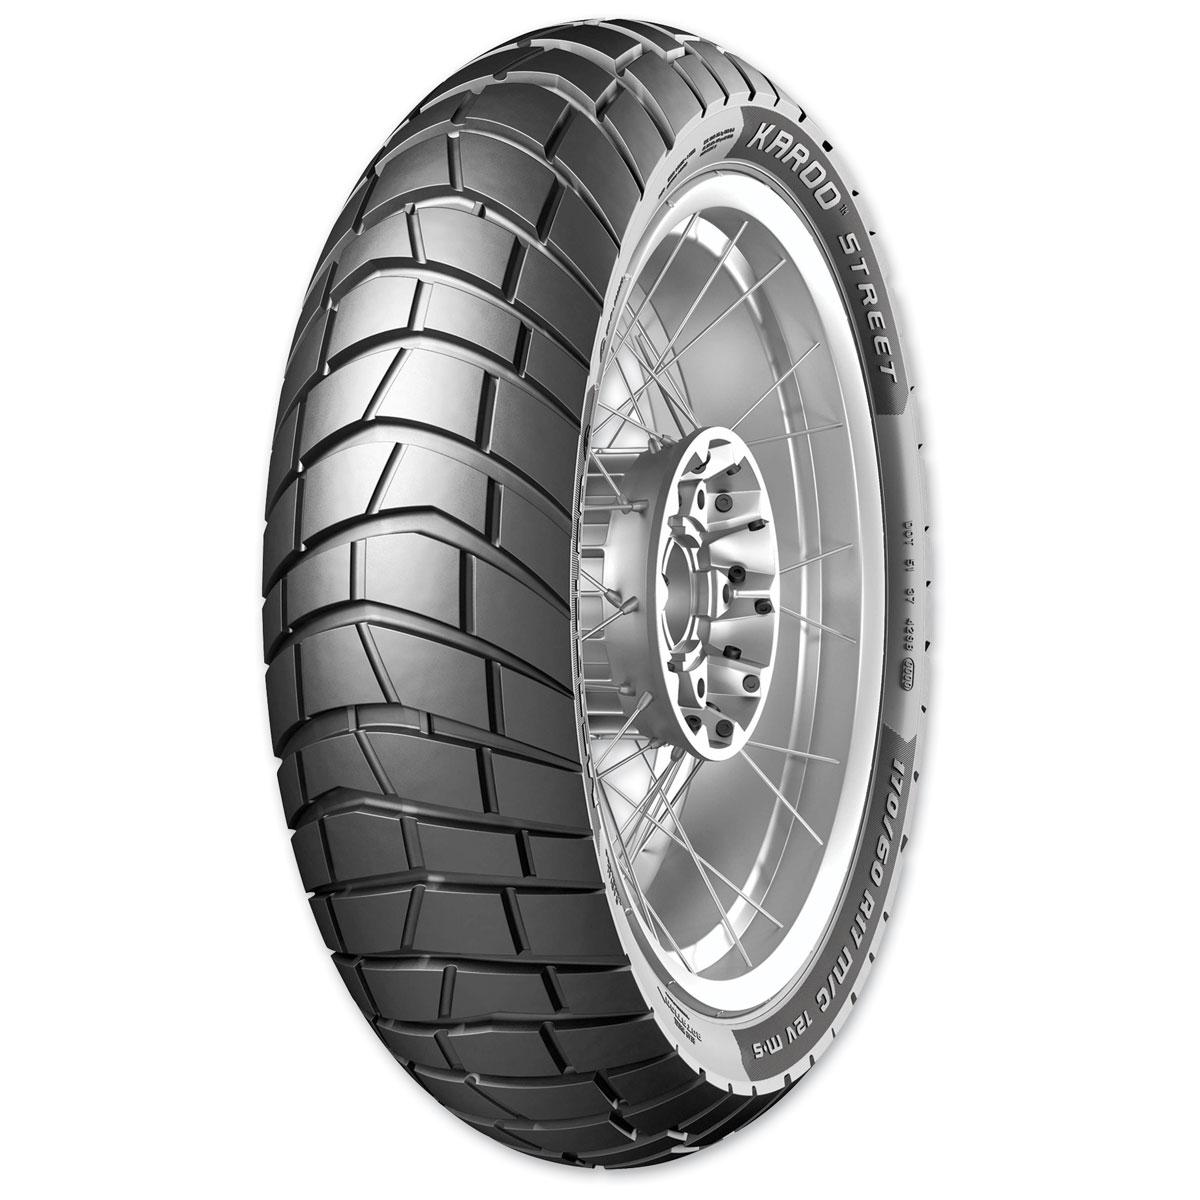 Metzeler Karoo Street 150/70R17 Rear Tire